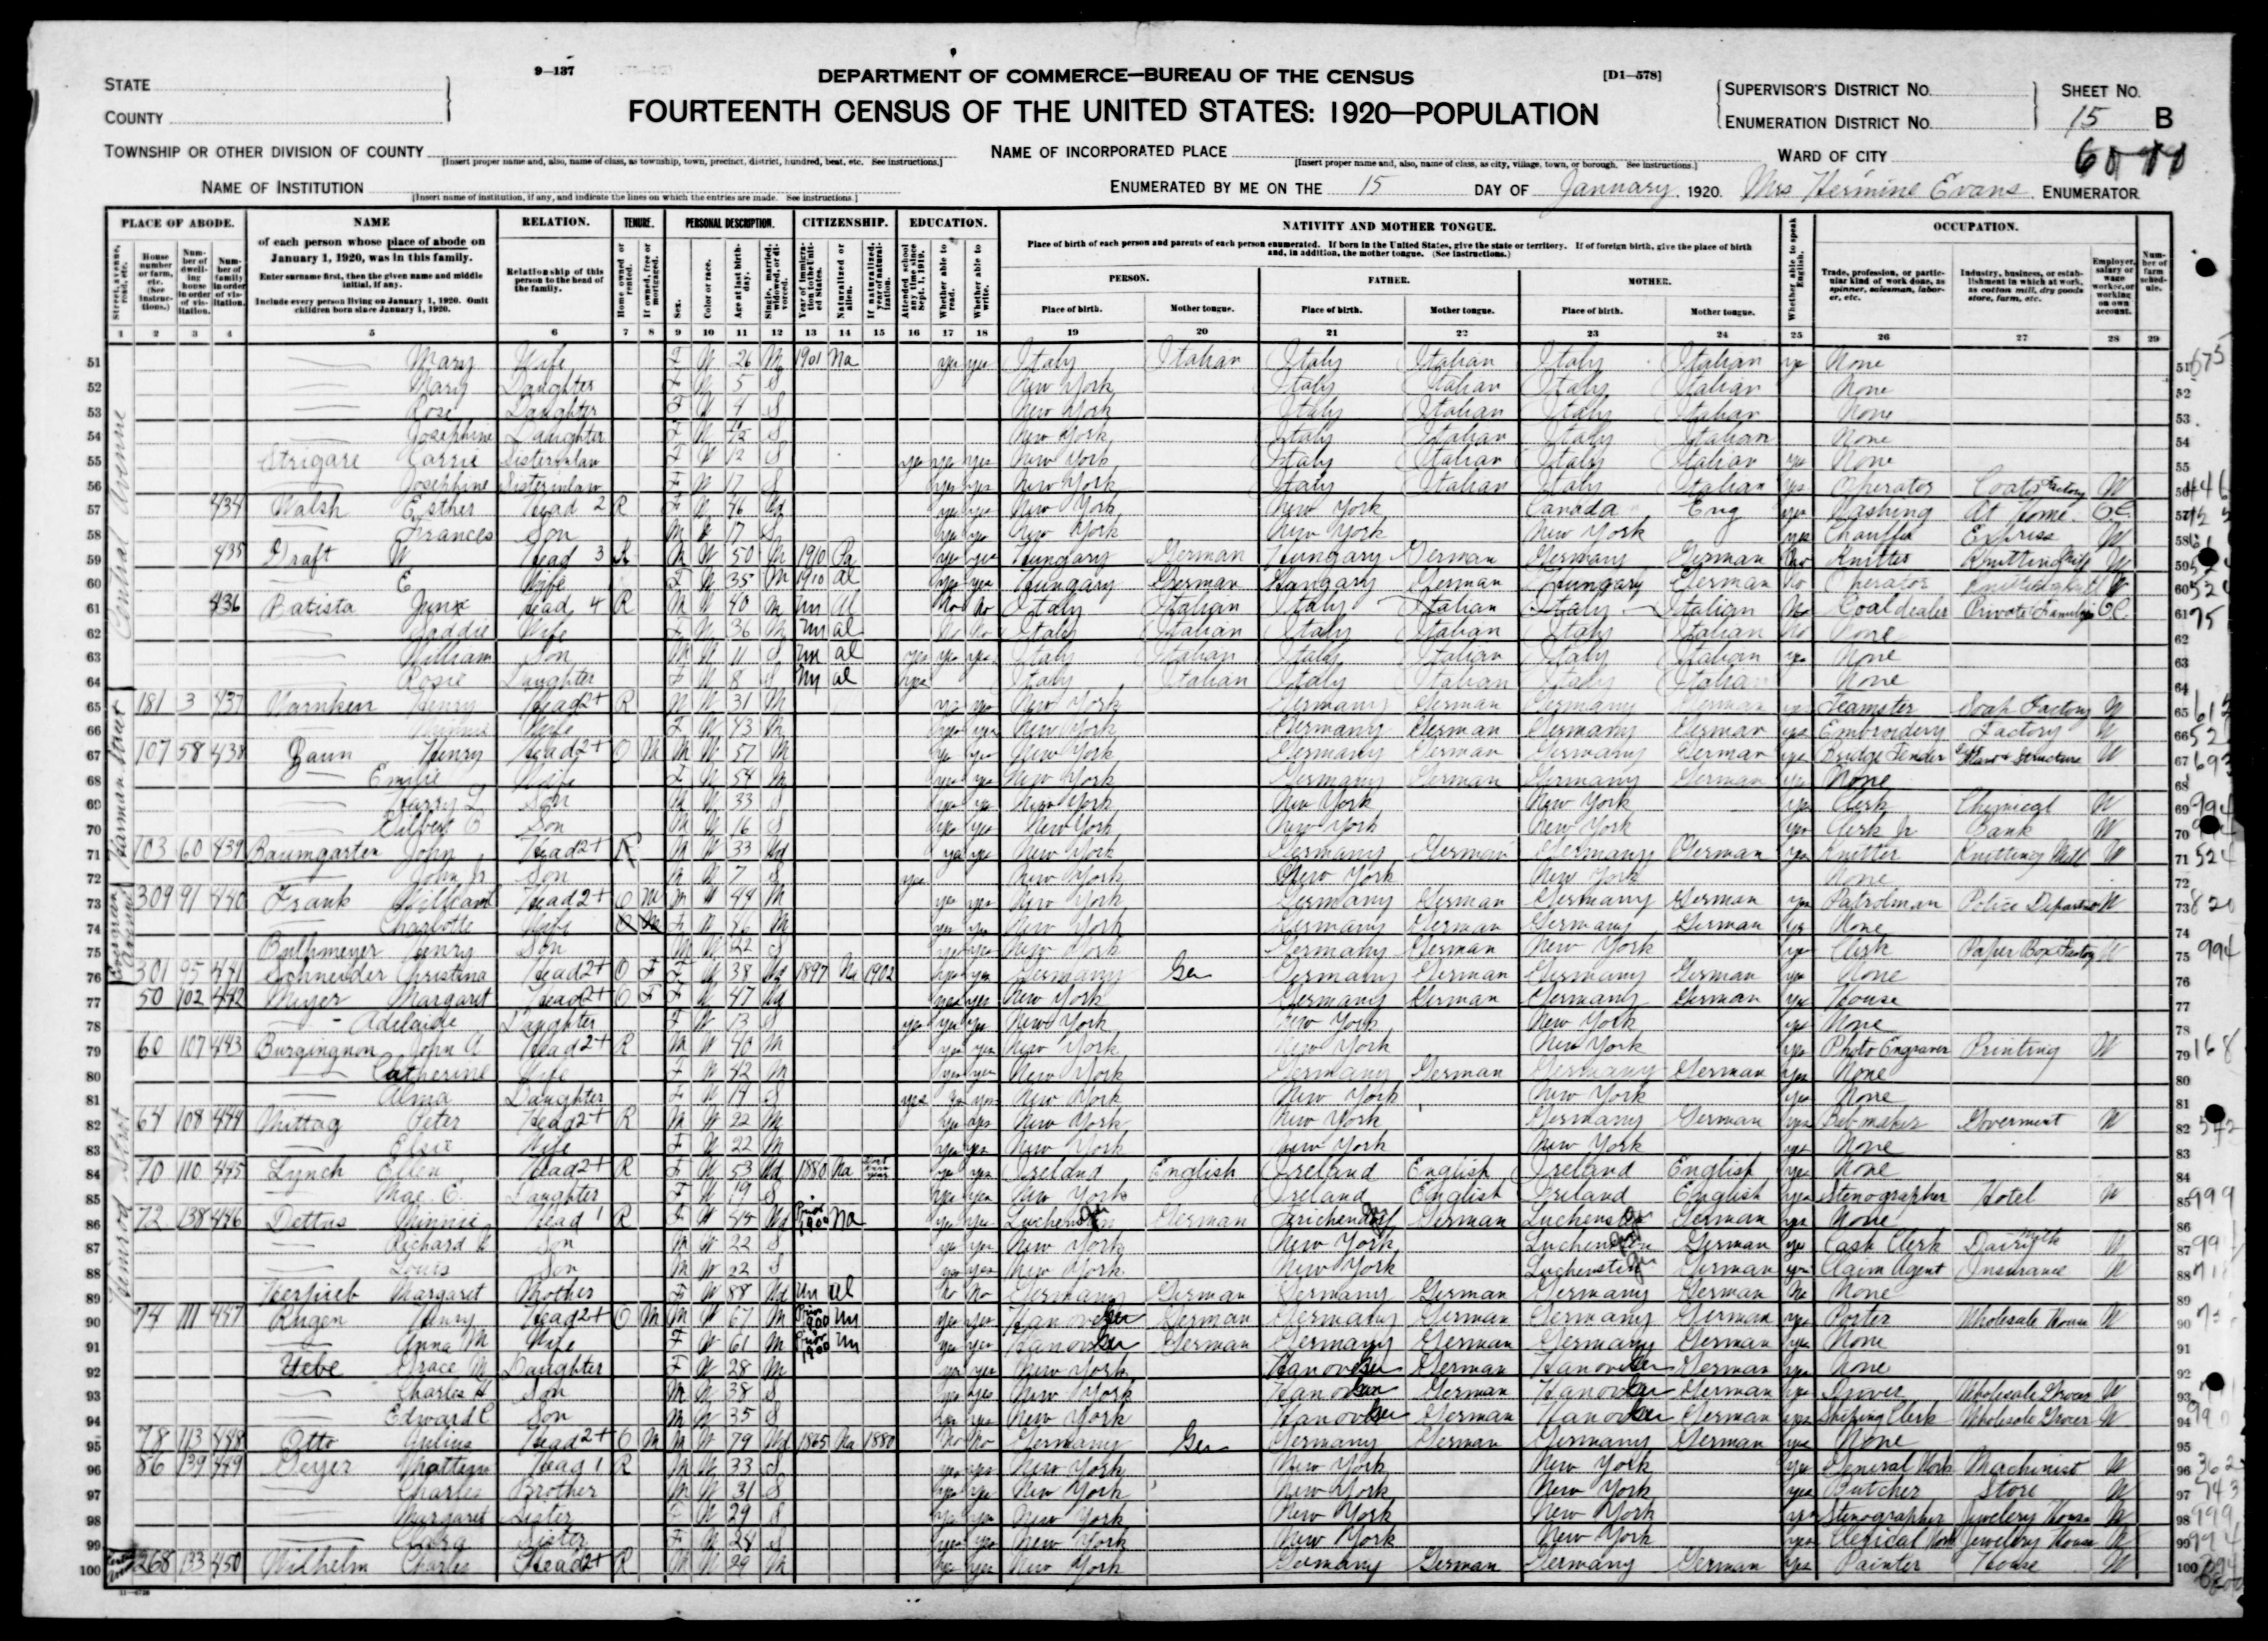 New York: KINGS County, Enumeration District 1242, Sheet No. 15B